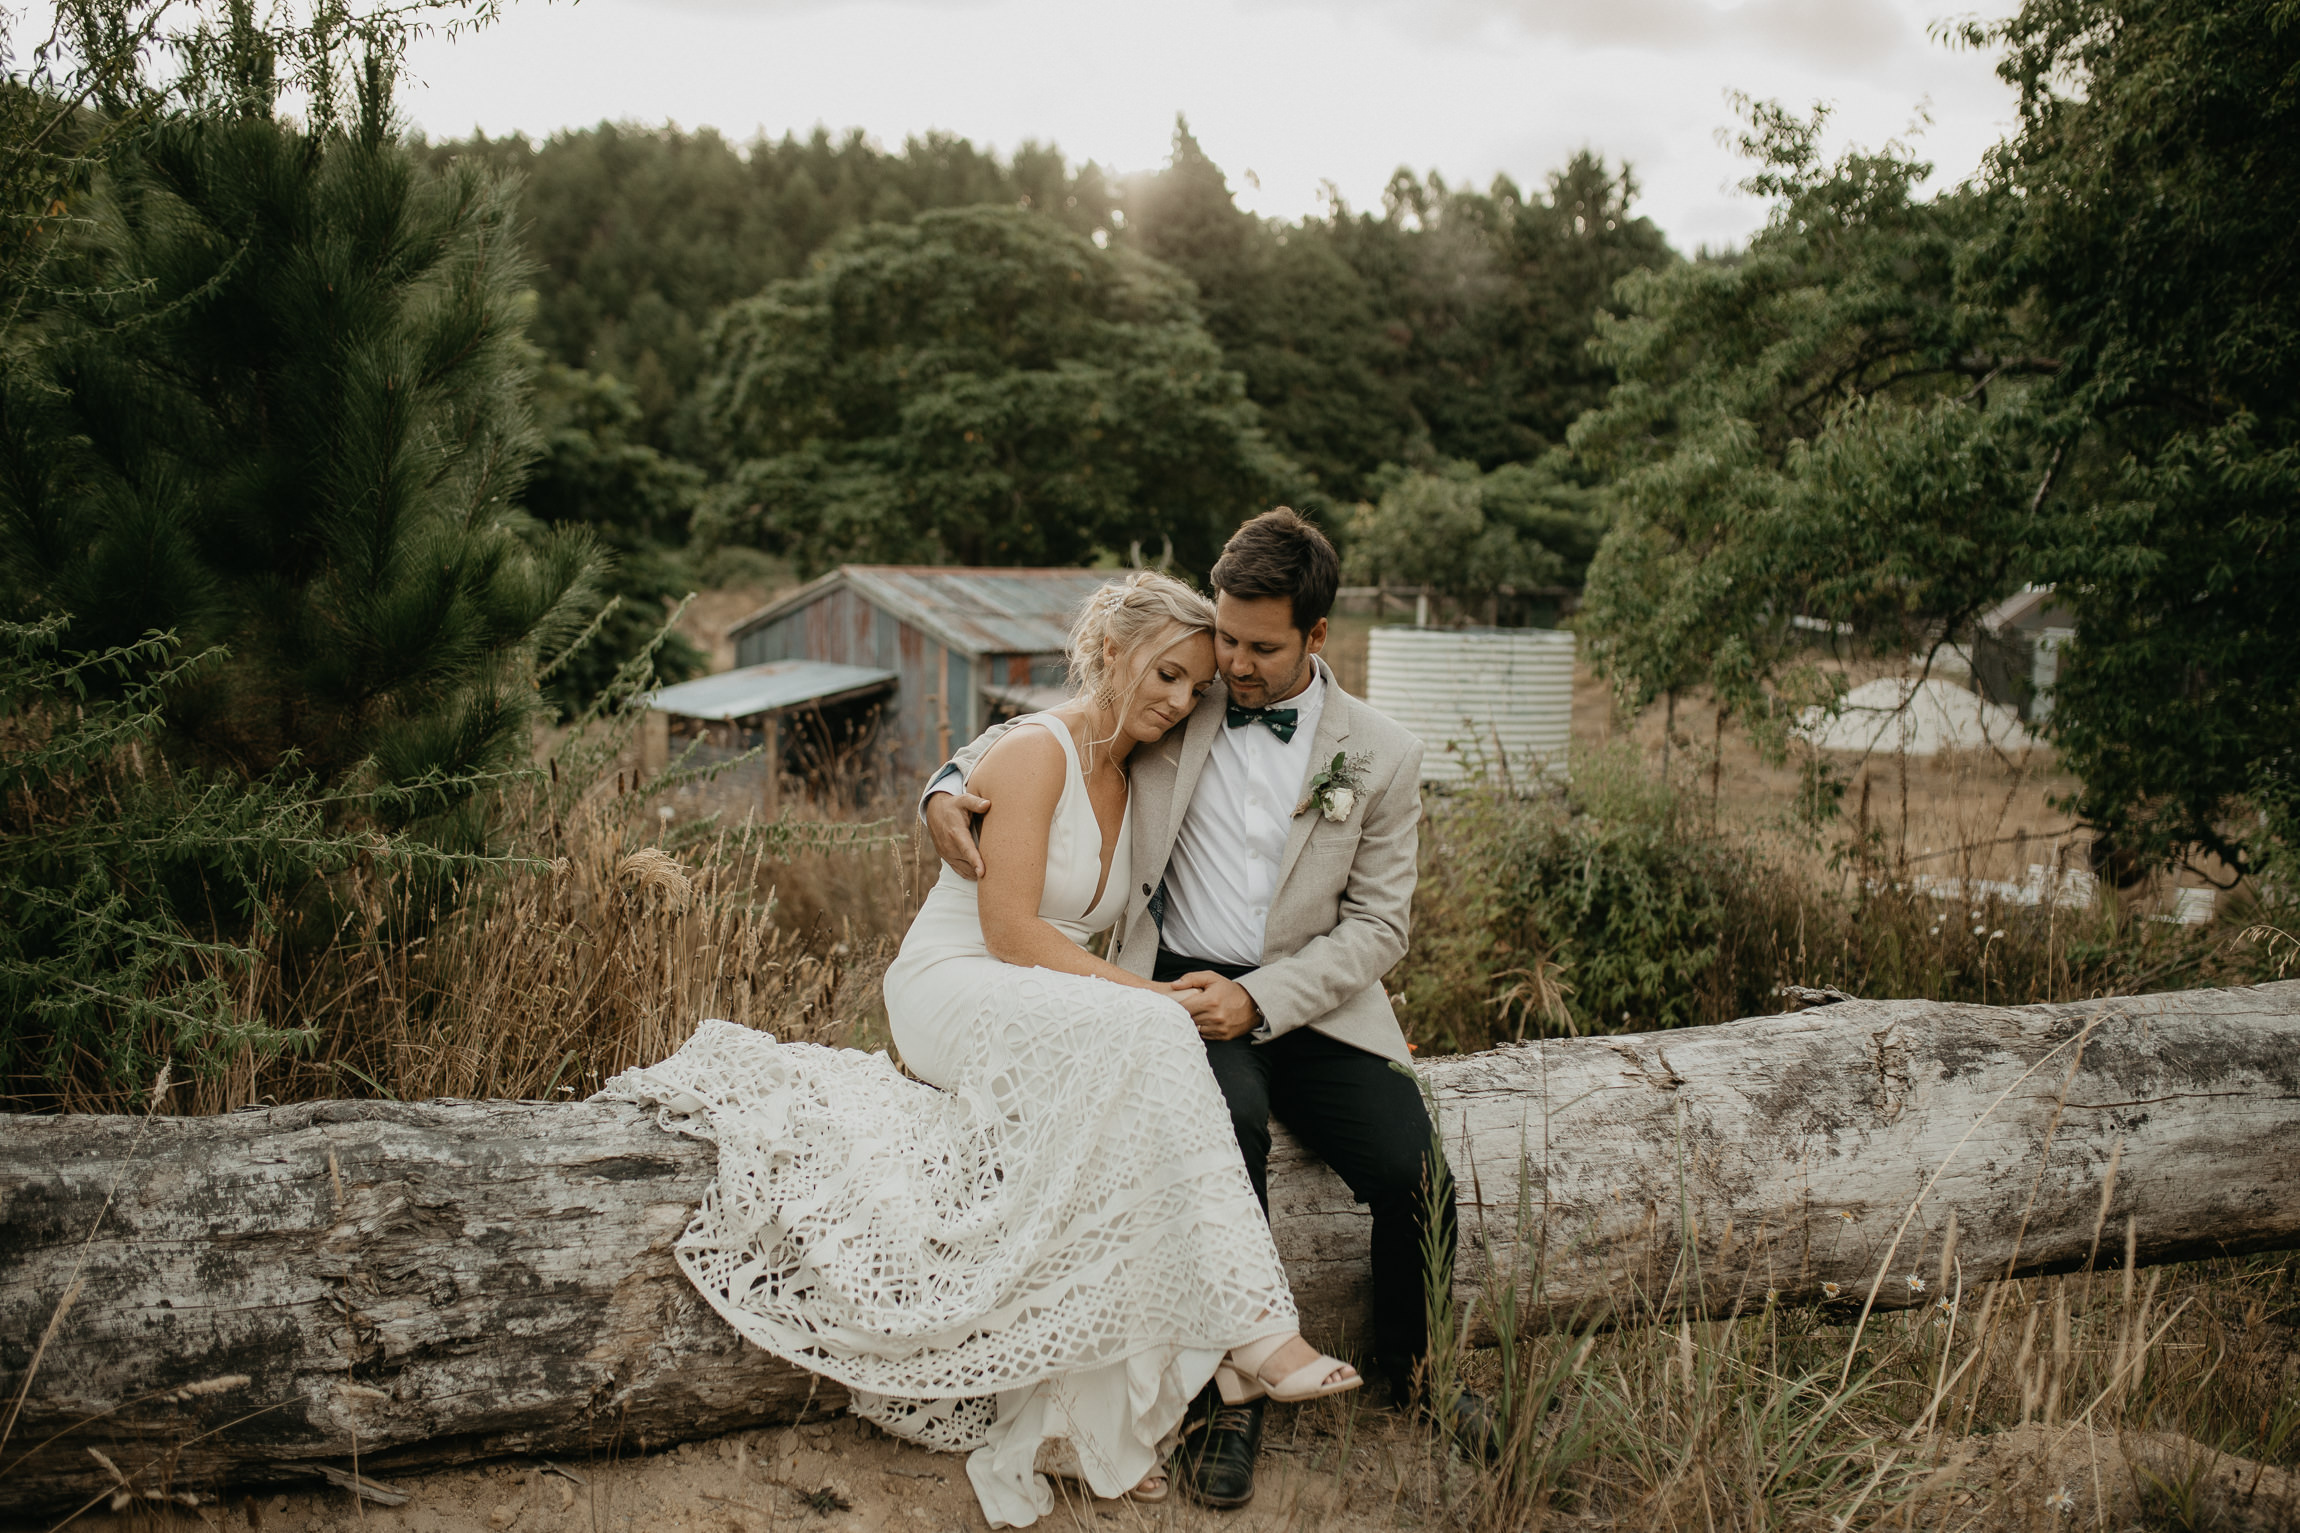 oldforestschool-wedding-blog-166.jpg